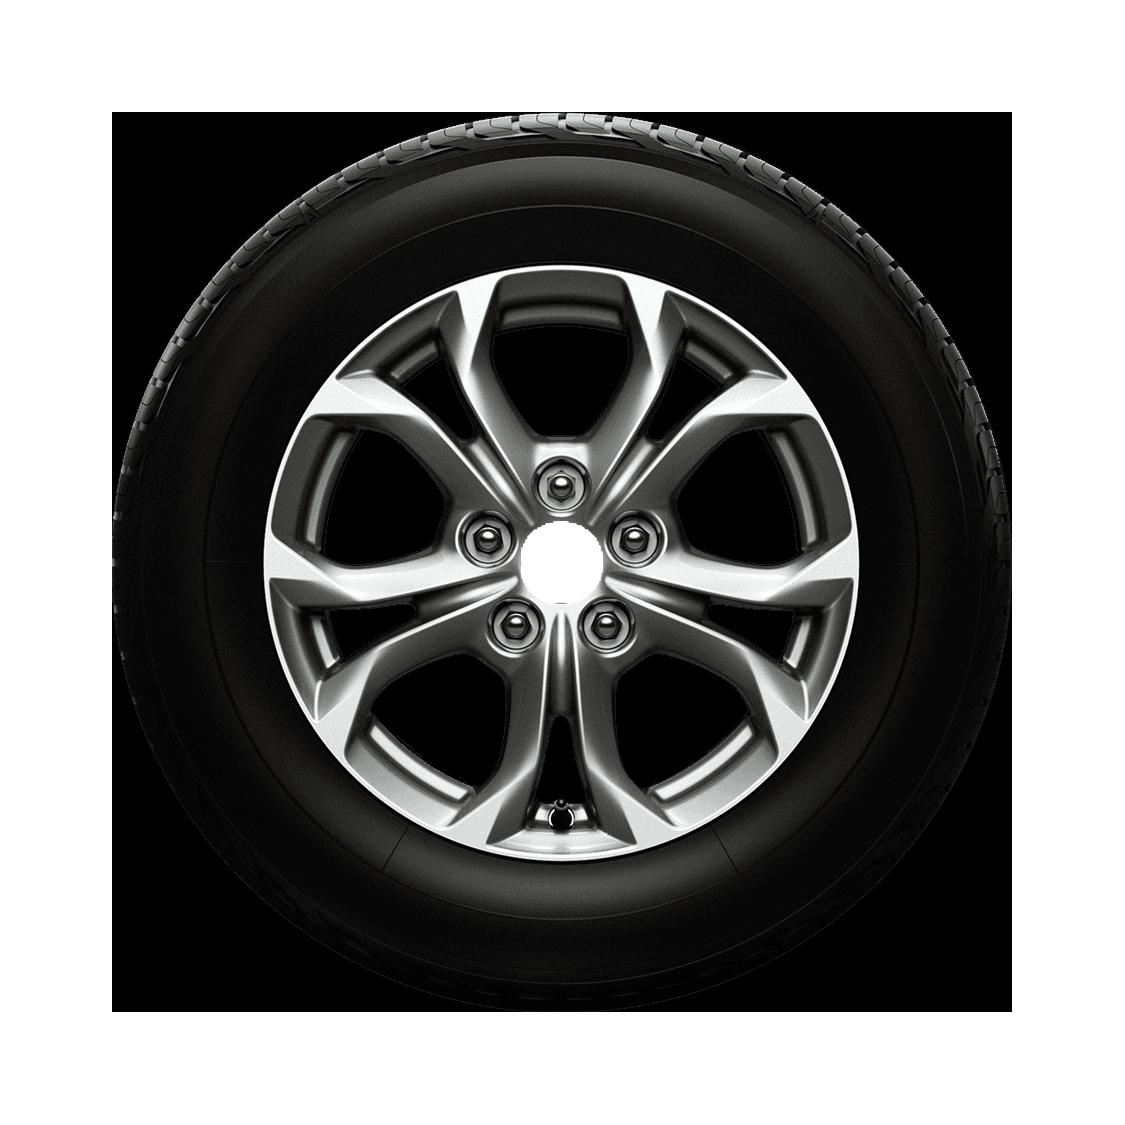 DAI Wheels Classic Gunmetal Reflex